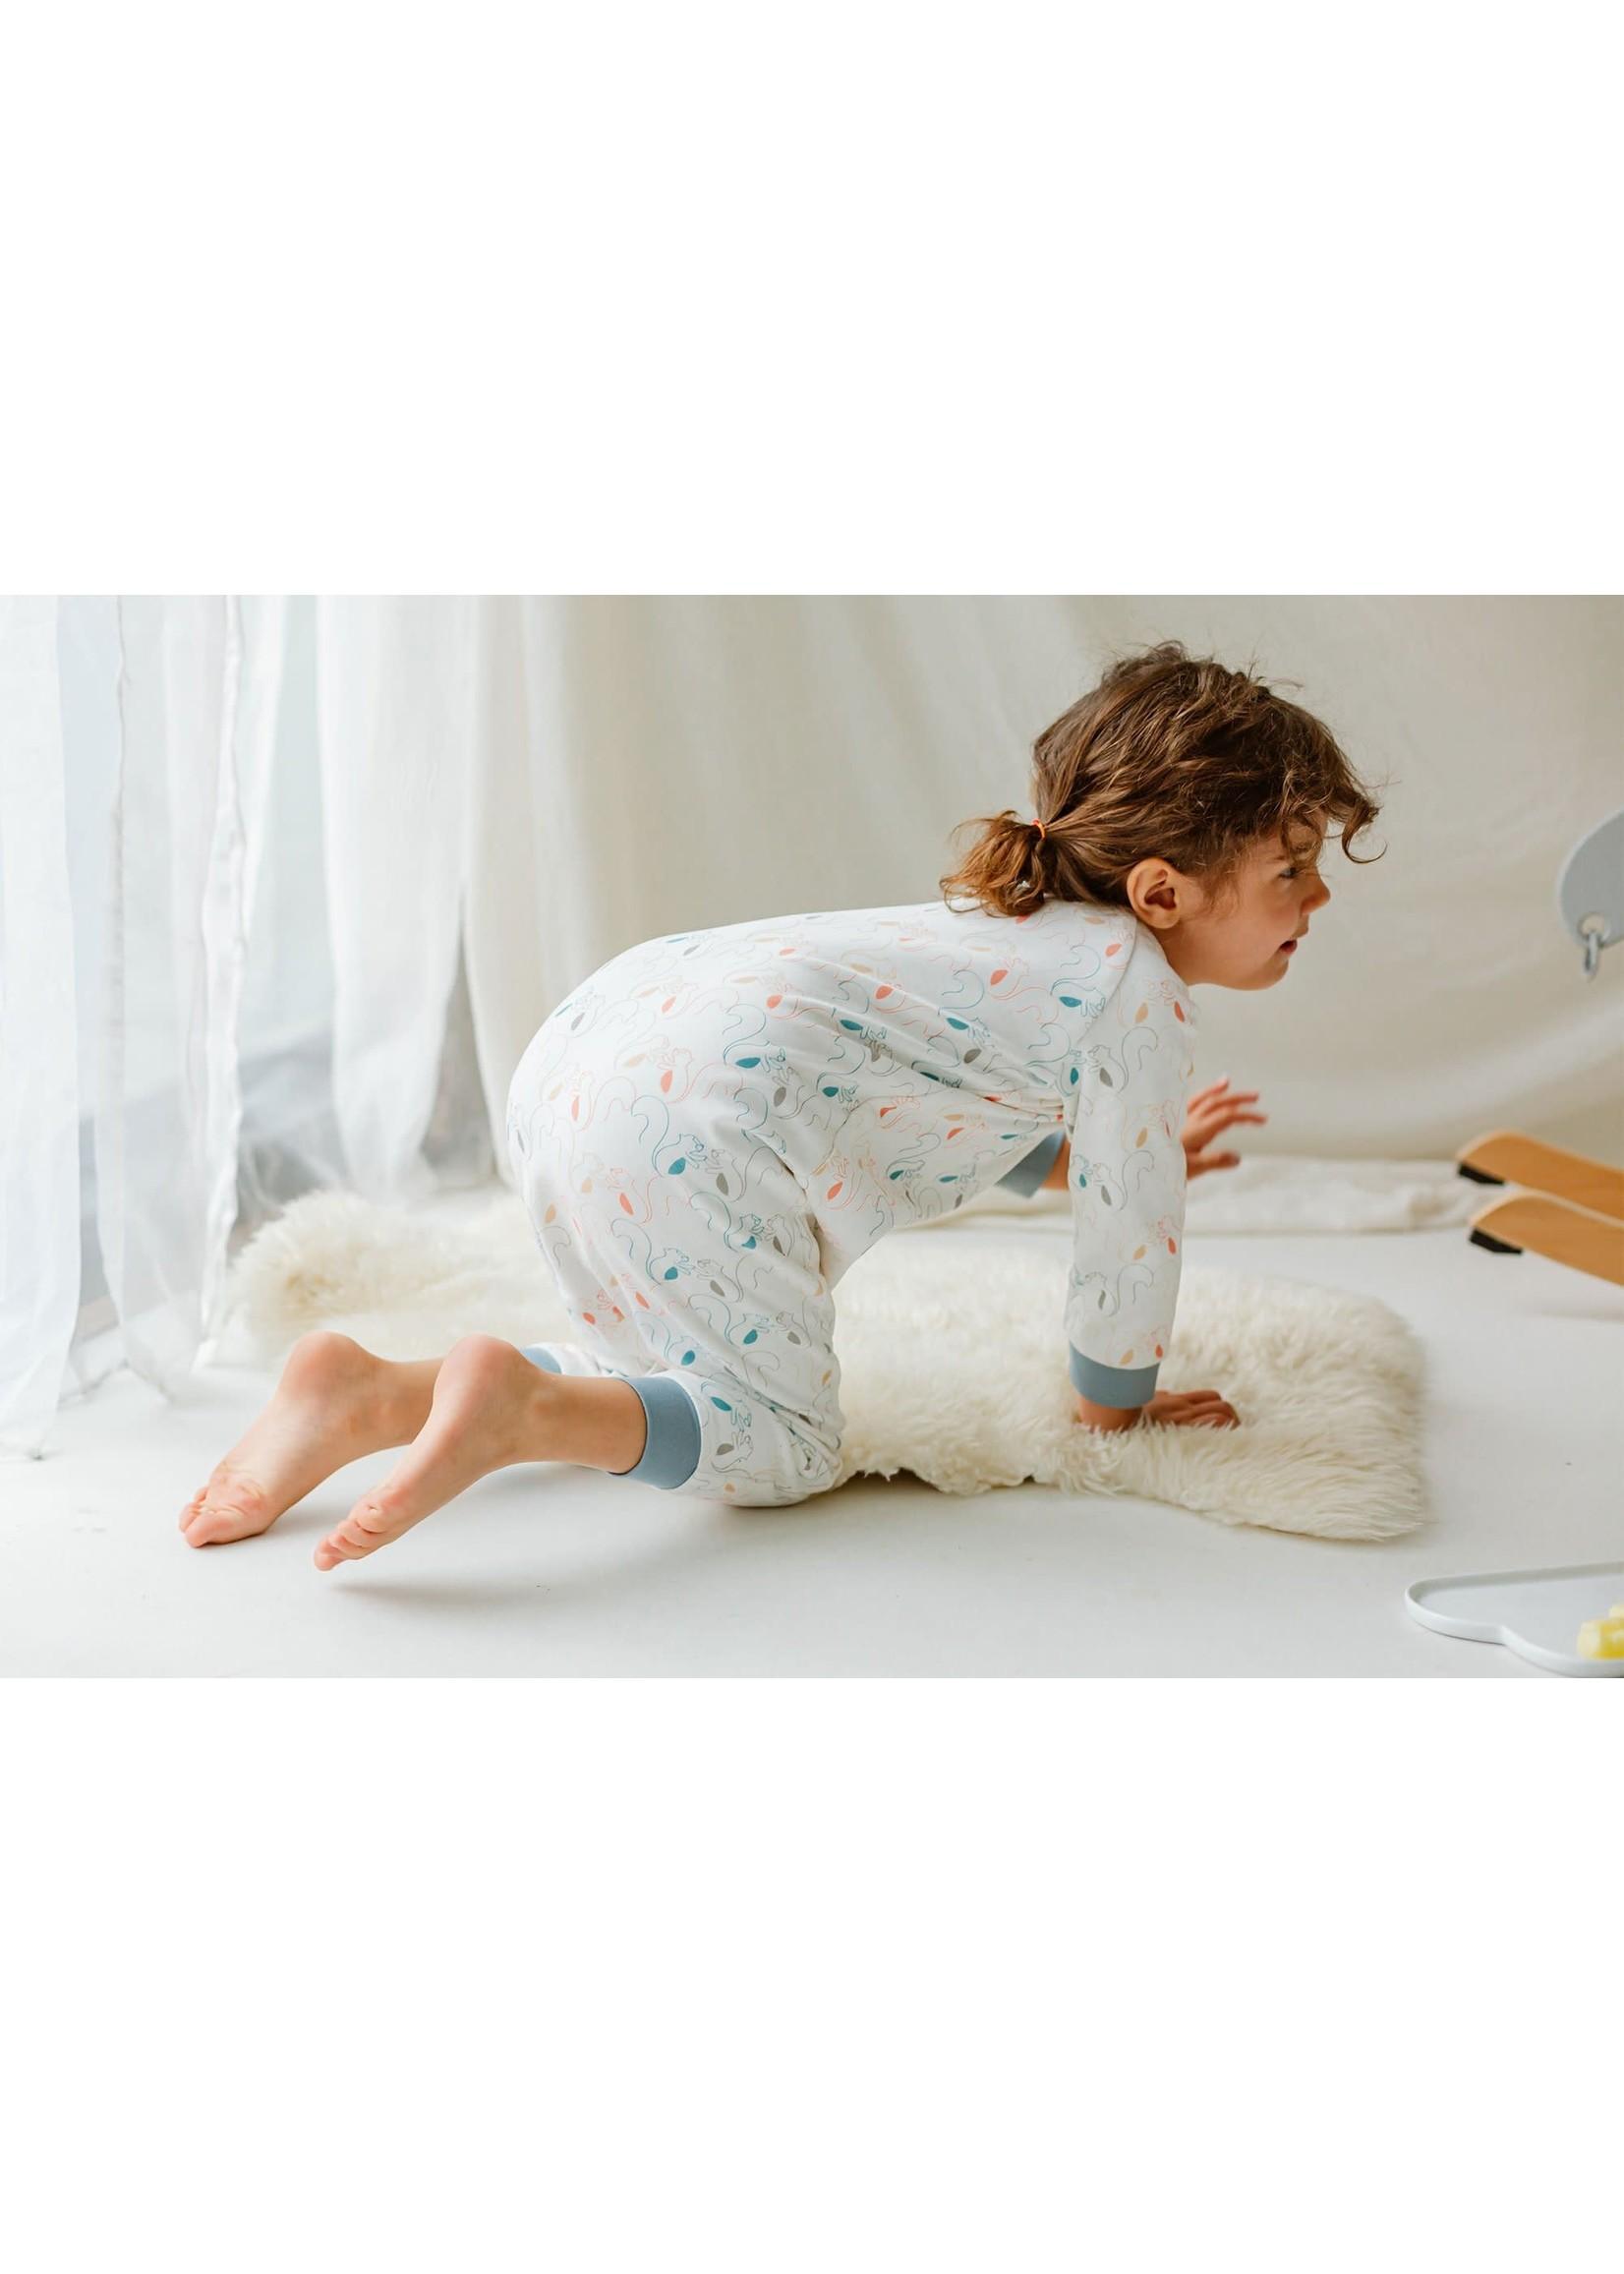 Nest Designs ND 0.6 Longsleeve Sleepsuit (Squirrely)